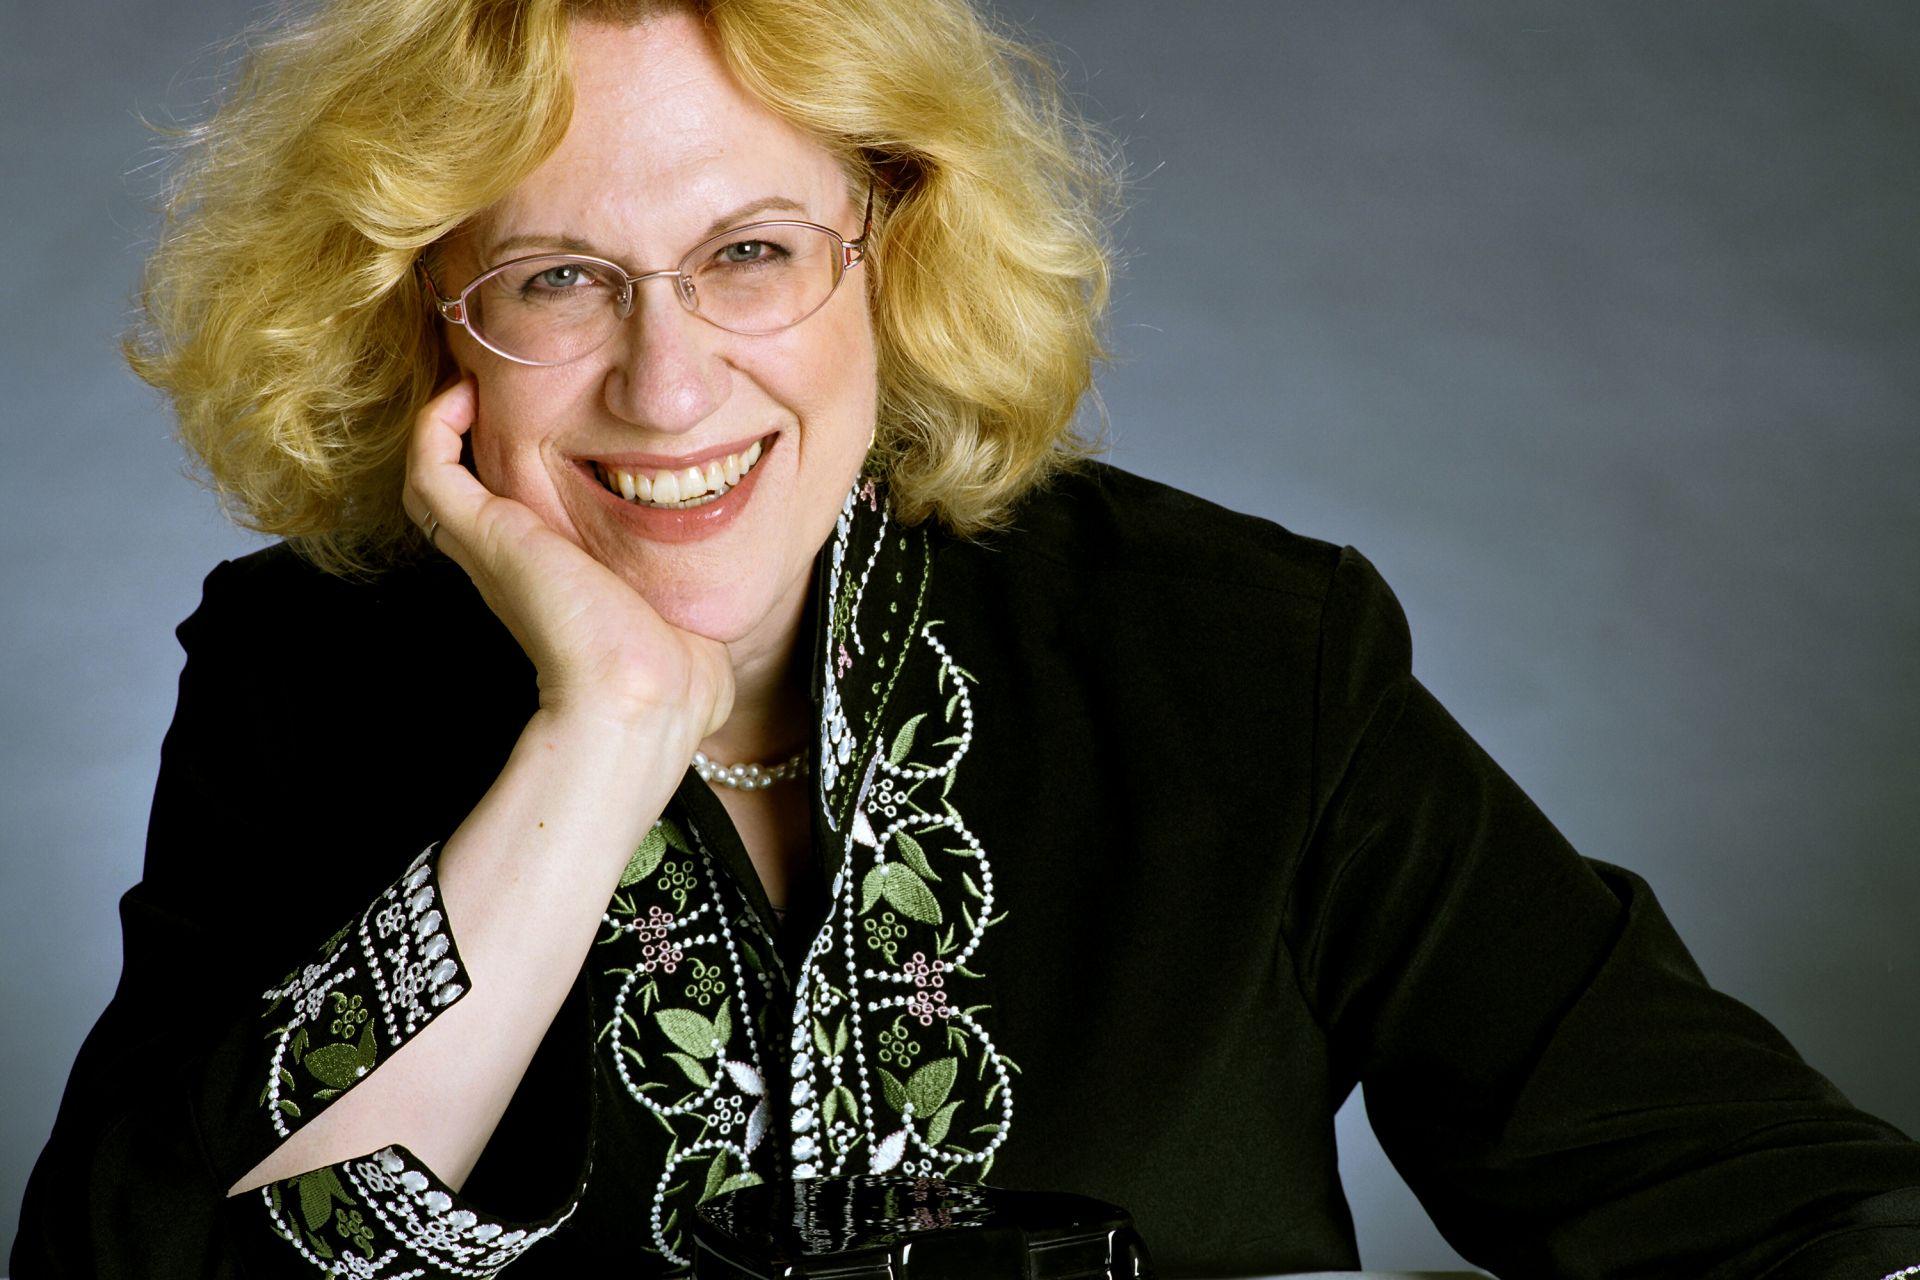 Sara Davis Buechner Solo Recital: Suesse and Gershwin, at Bargemusic